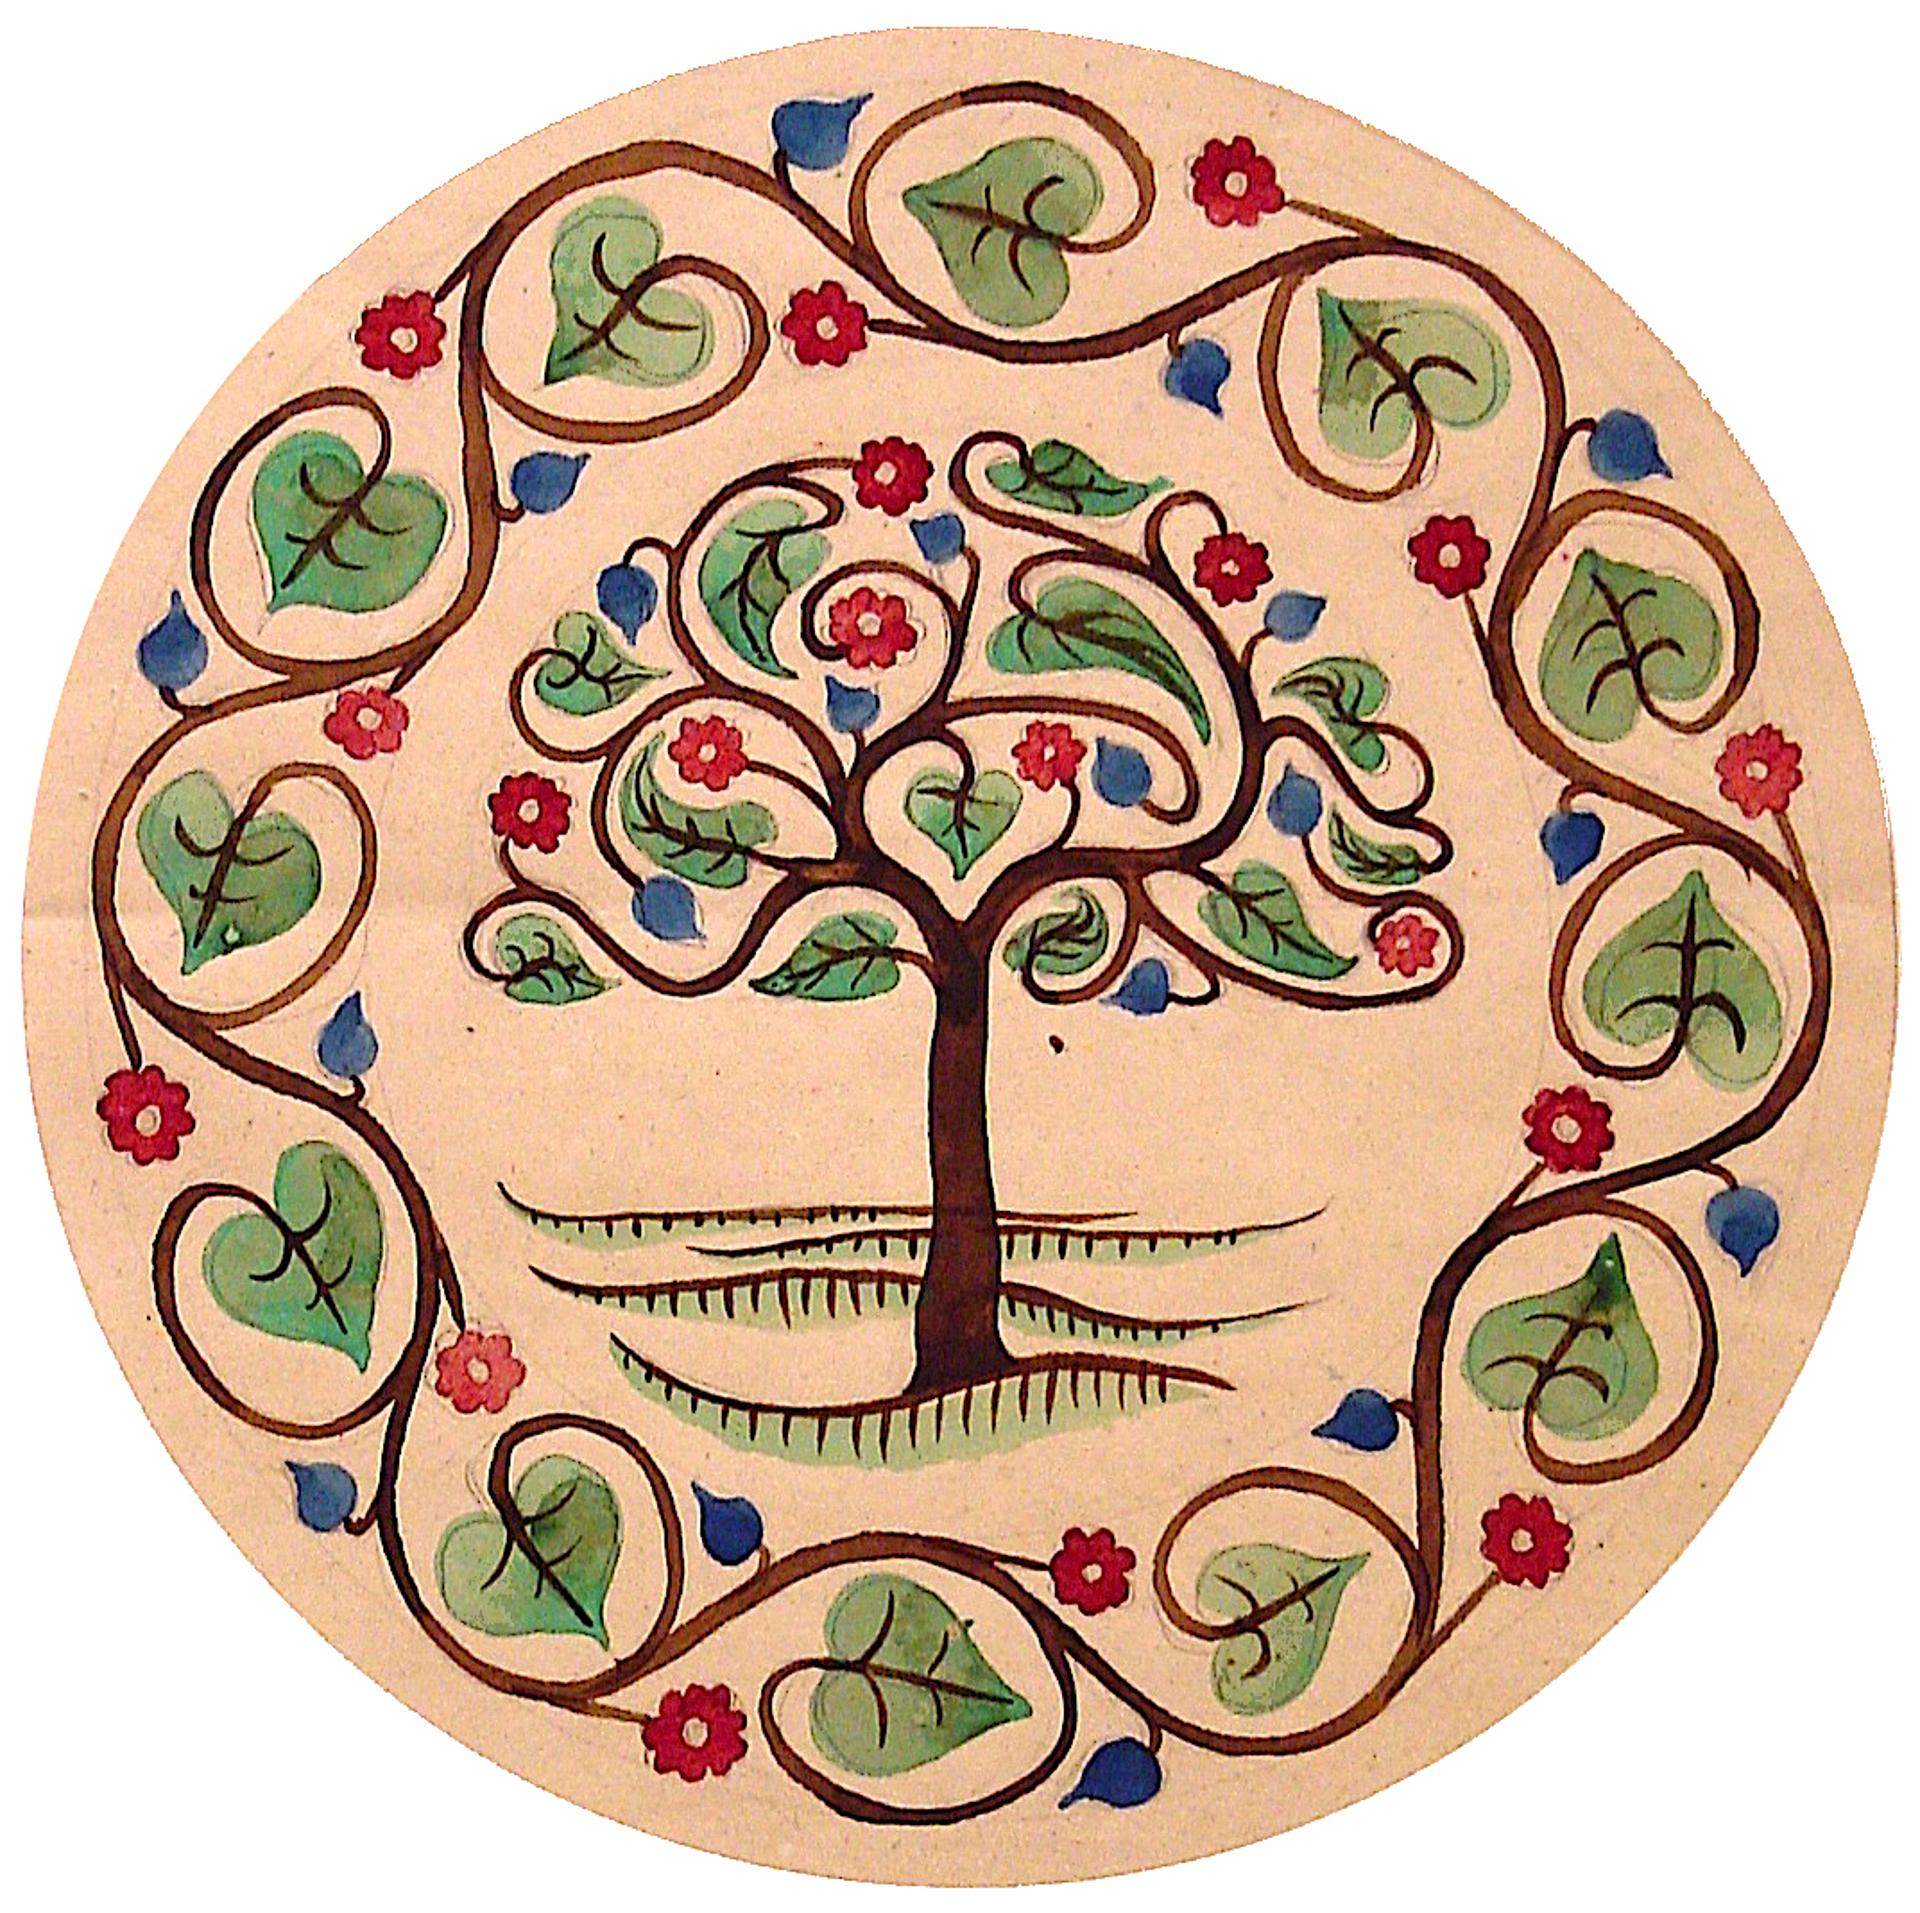 Oak Tree and Flowers by M.C. Escher